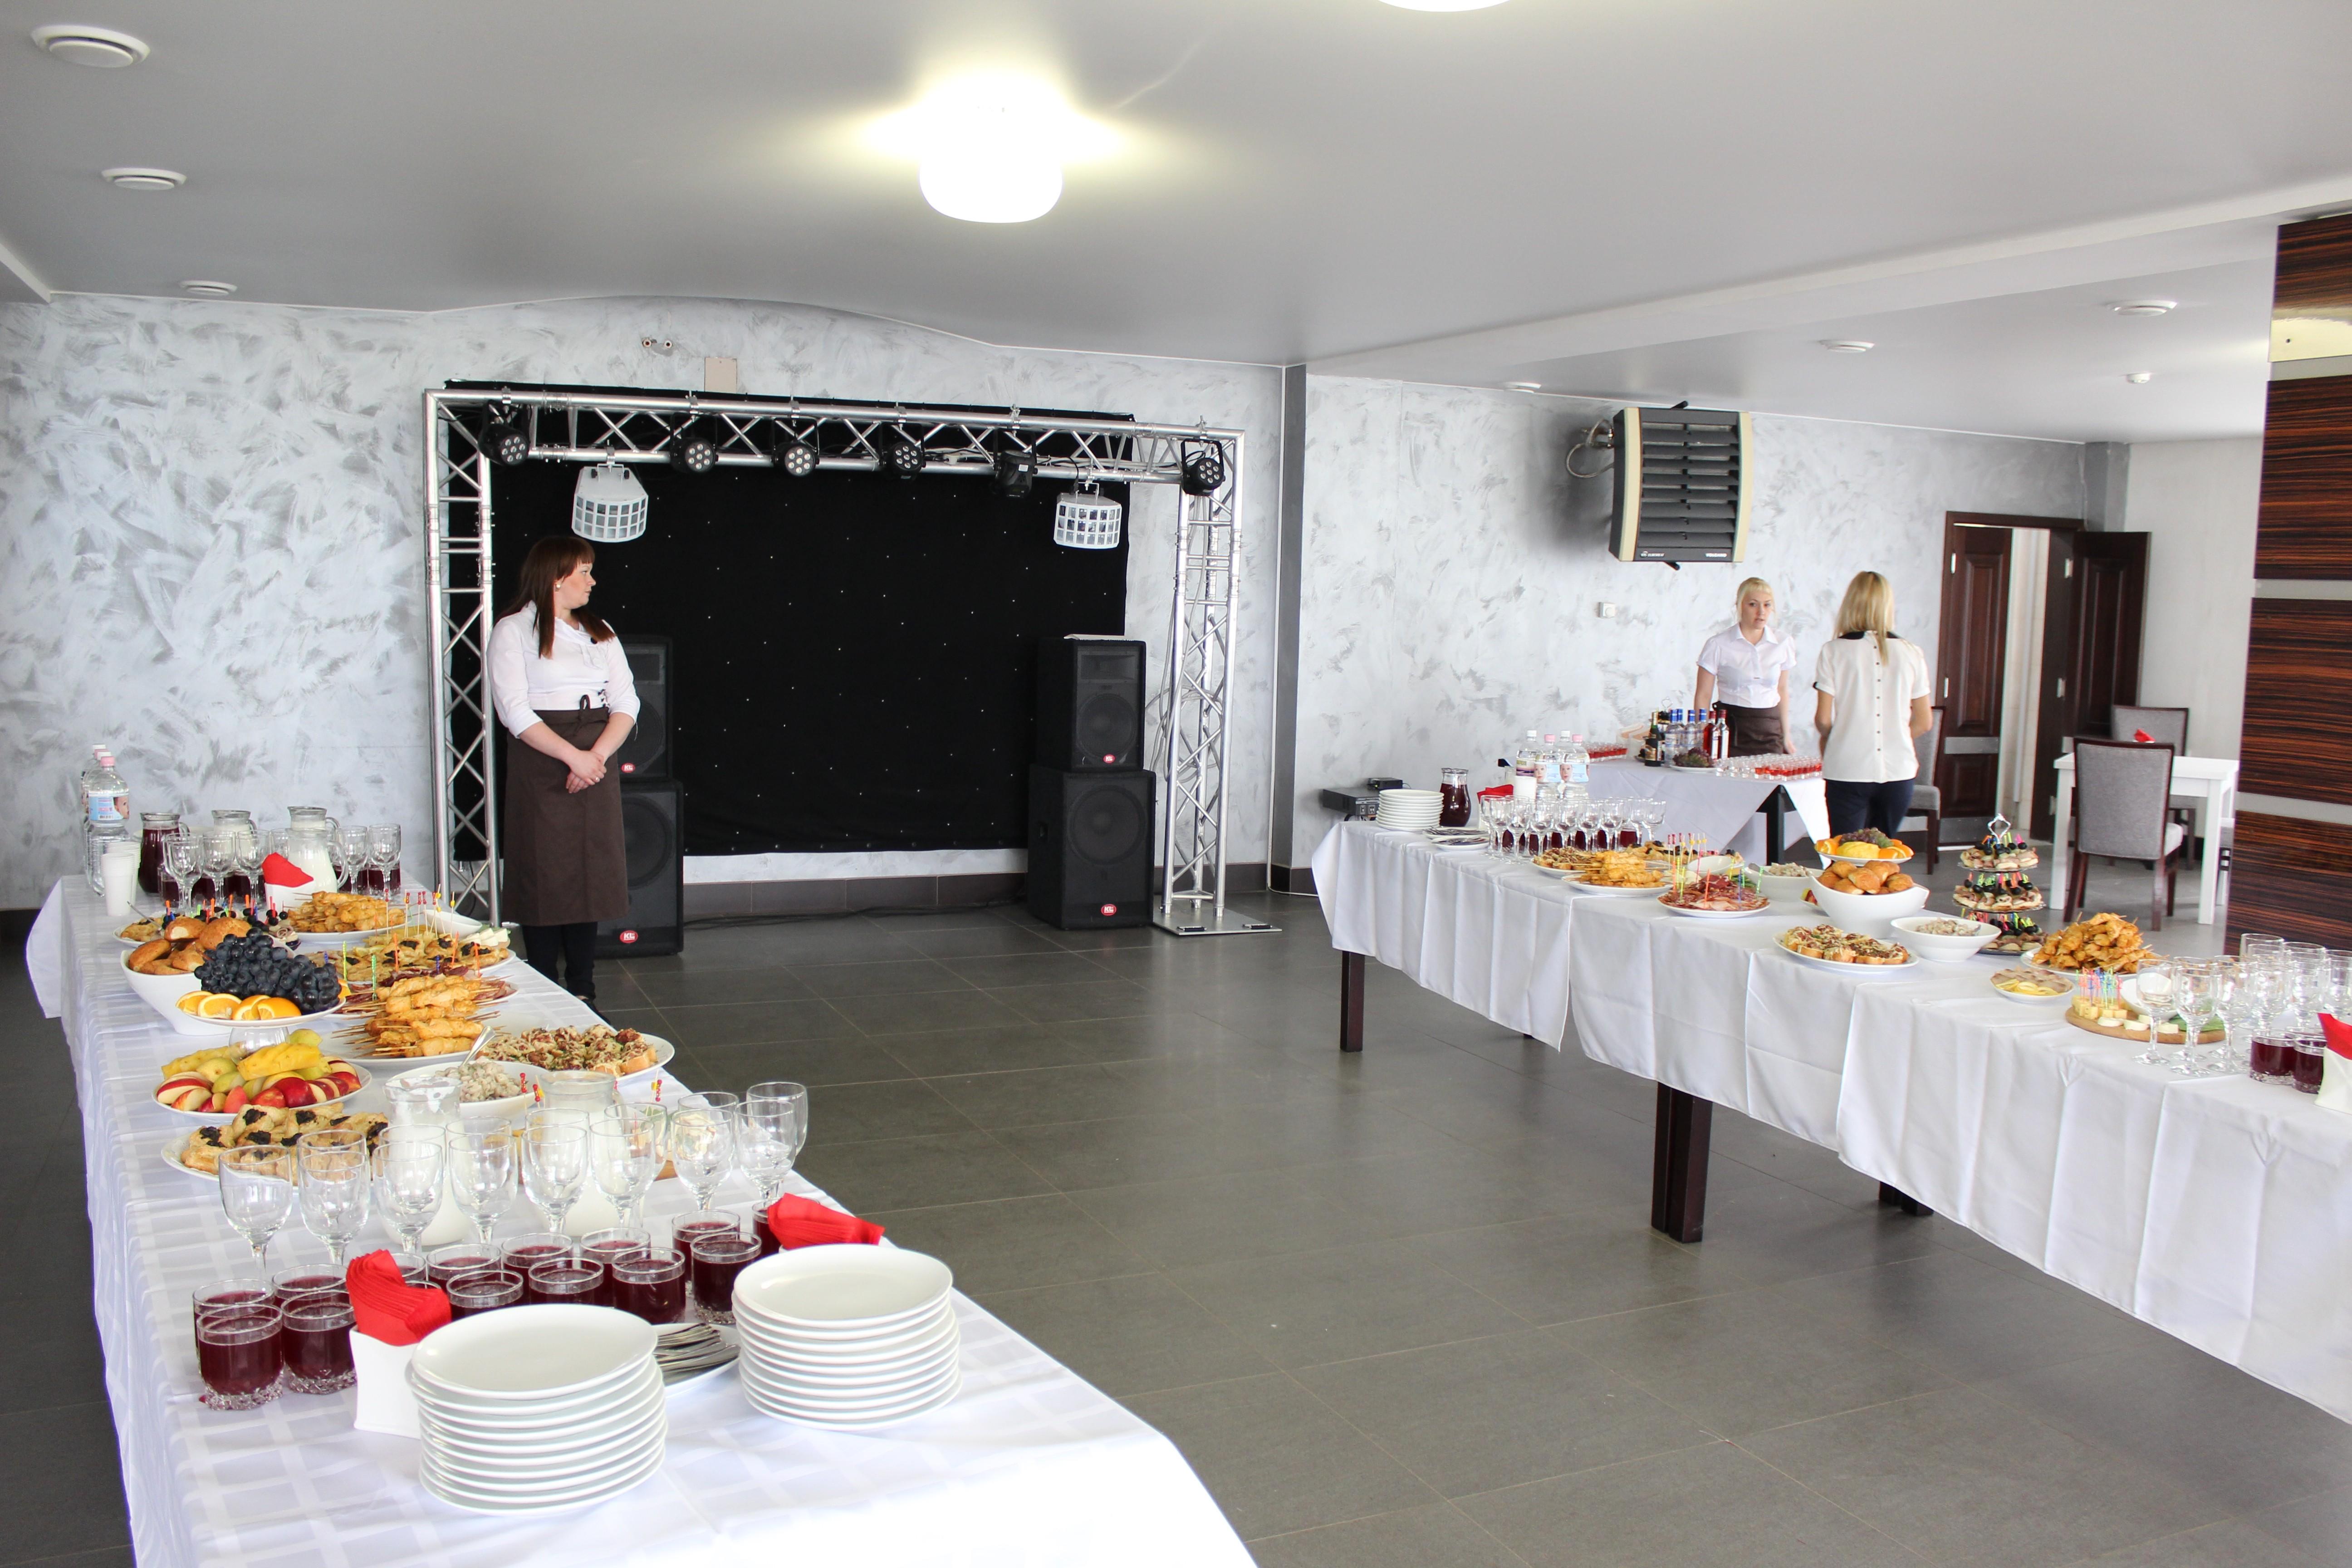 zal-restorana-1